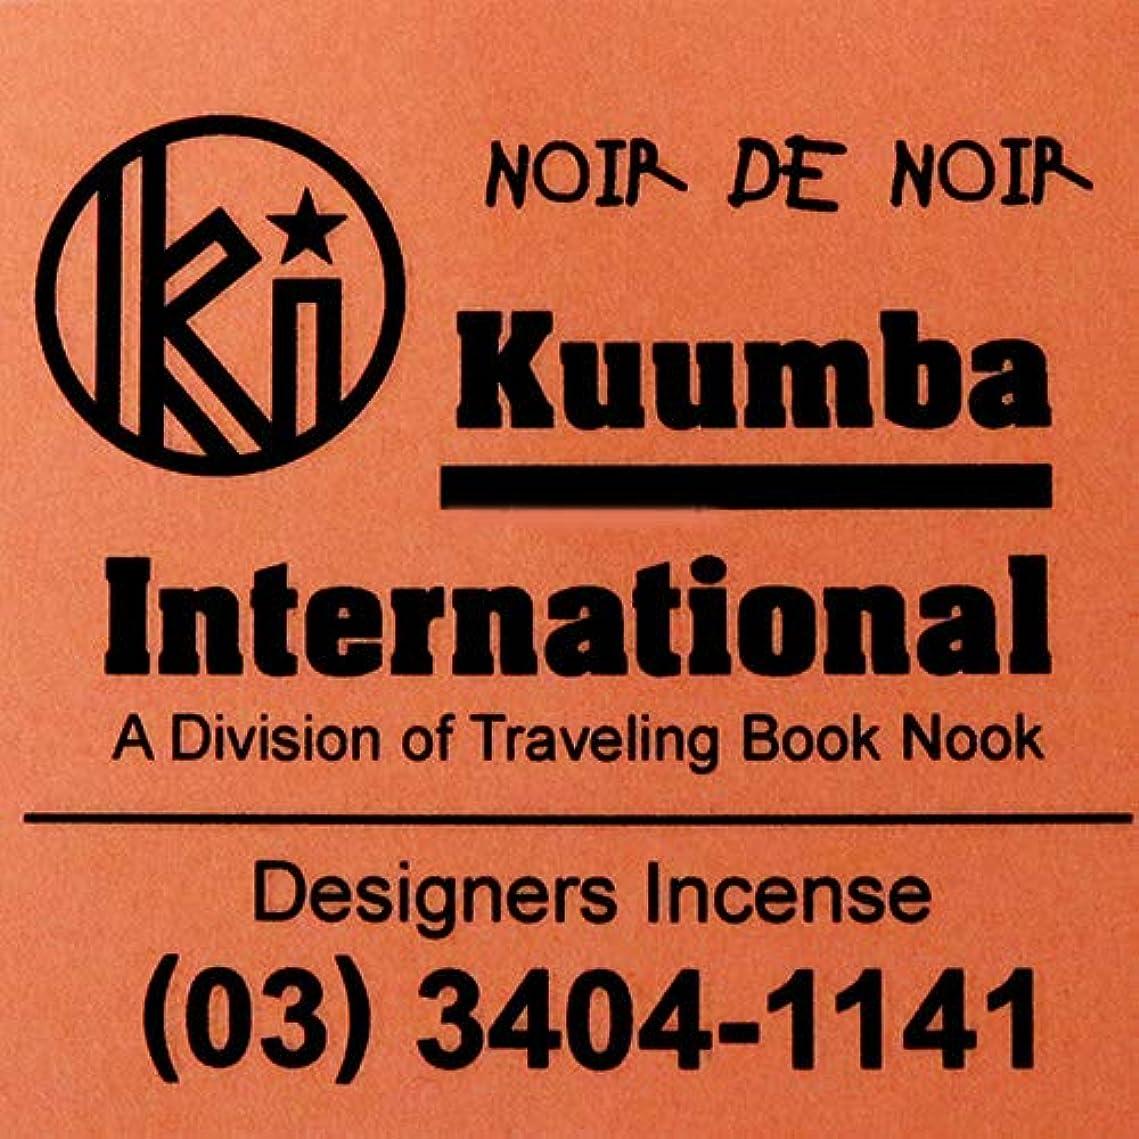 疼痛一部昇進(クンバ) KUUMBA『incense』(NOIR DE NOIR) (NOIR DE NOIR, Regular size)